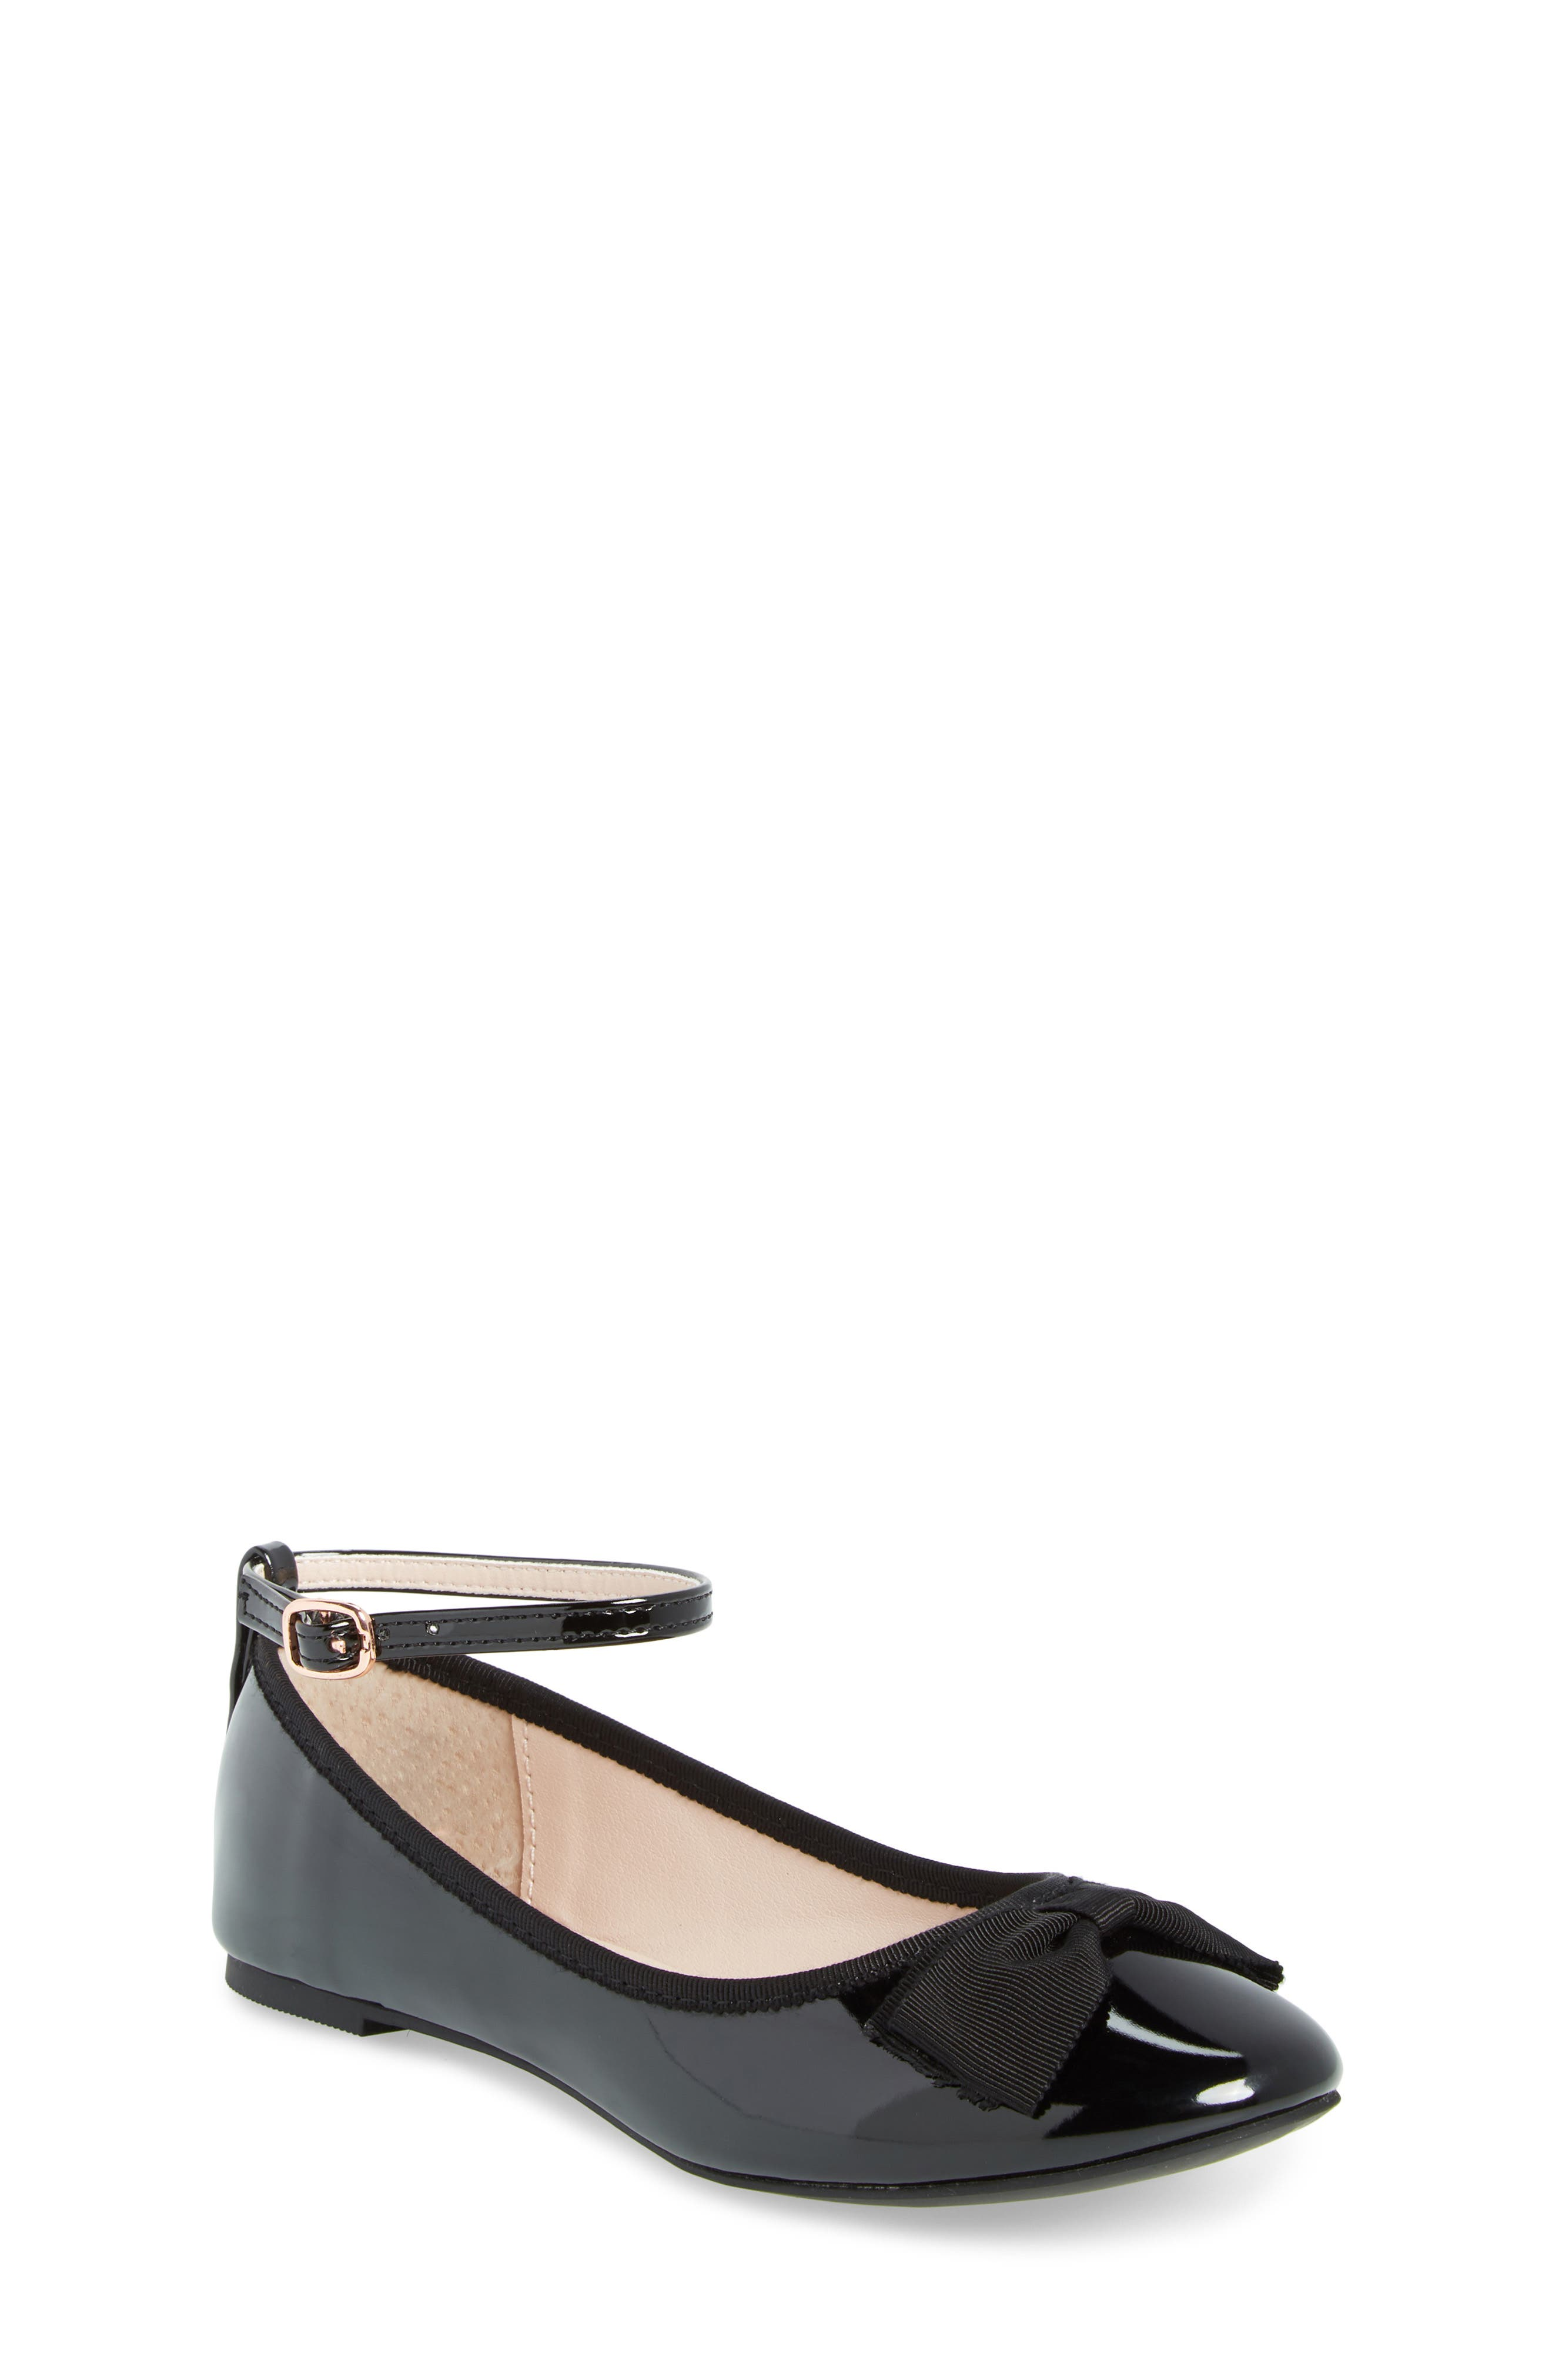 Pipa Ankle Strap Ballet Flat,                         Main,                         color, BLACK FAUX PATENT